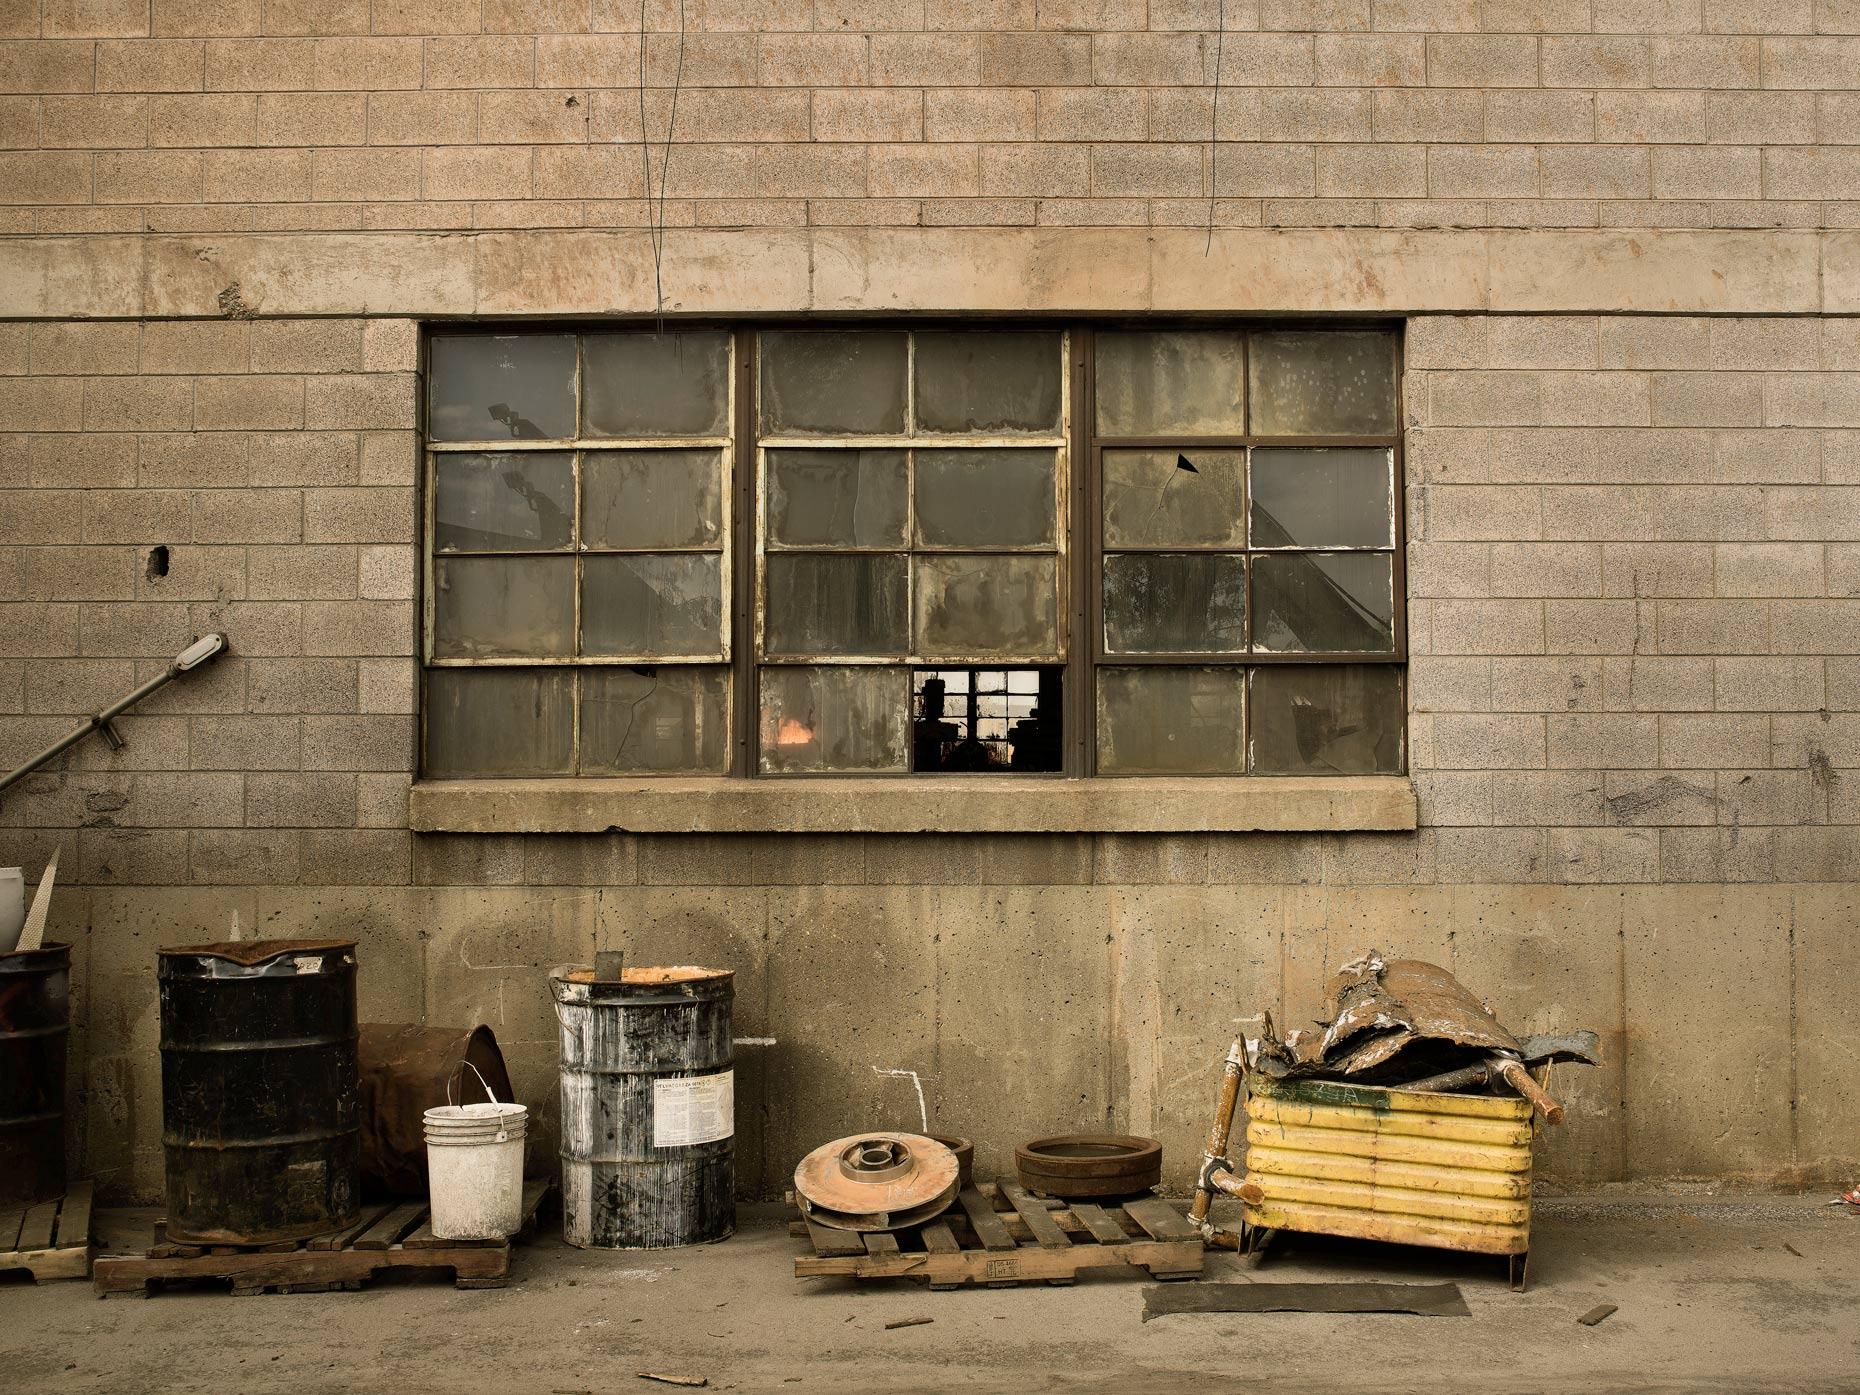 Projects-Editorial-Photography-Derek-Israelsen-006-Broken_Window.jpg